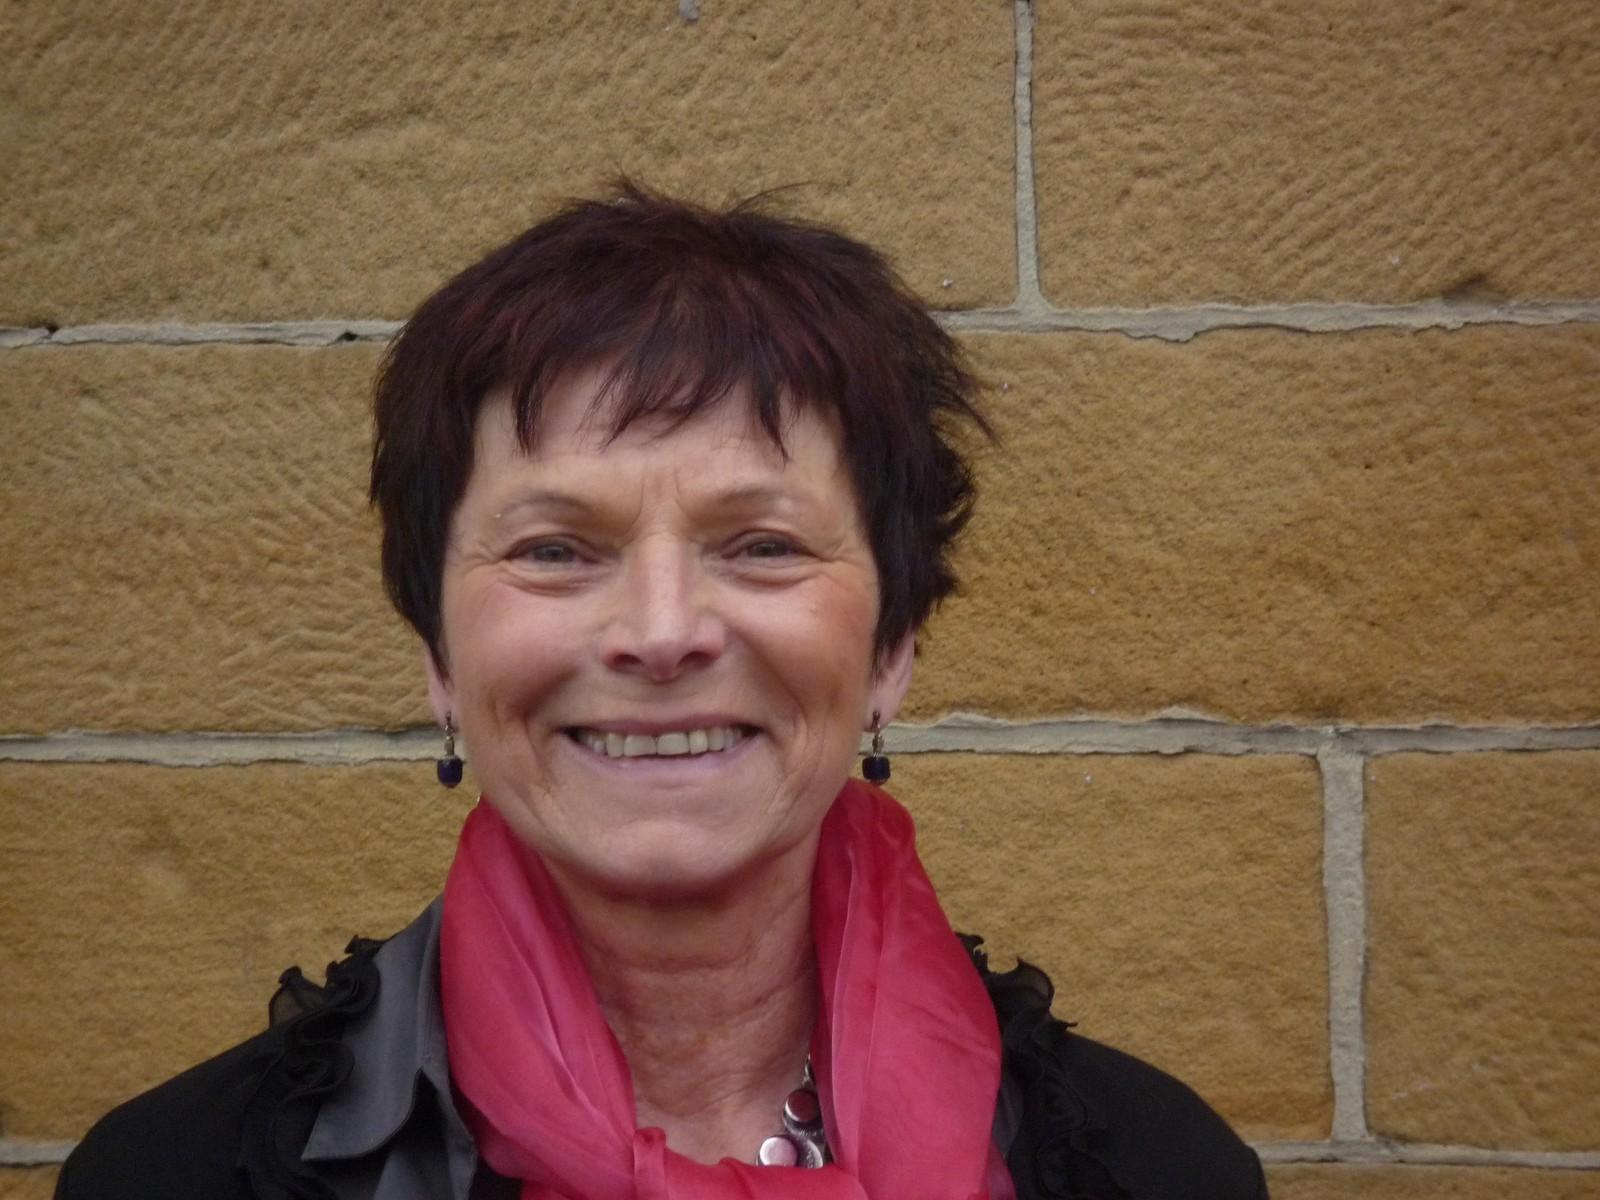 Colette Lansman